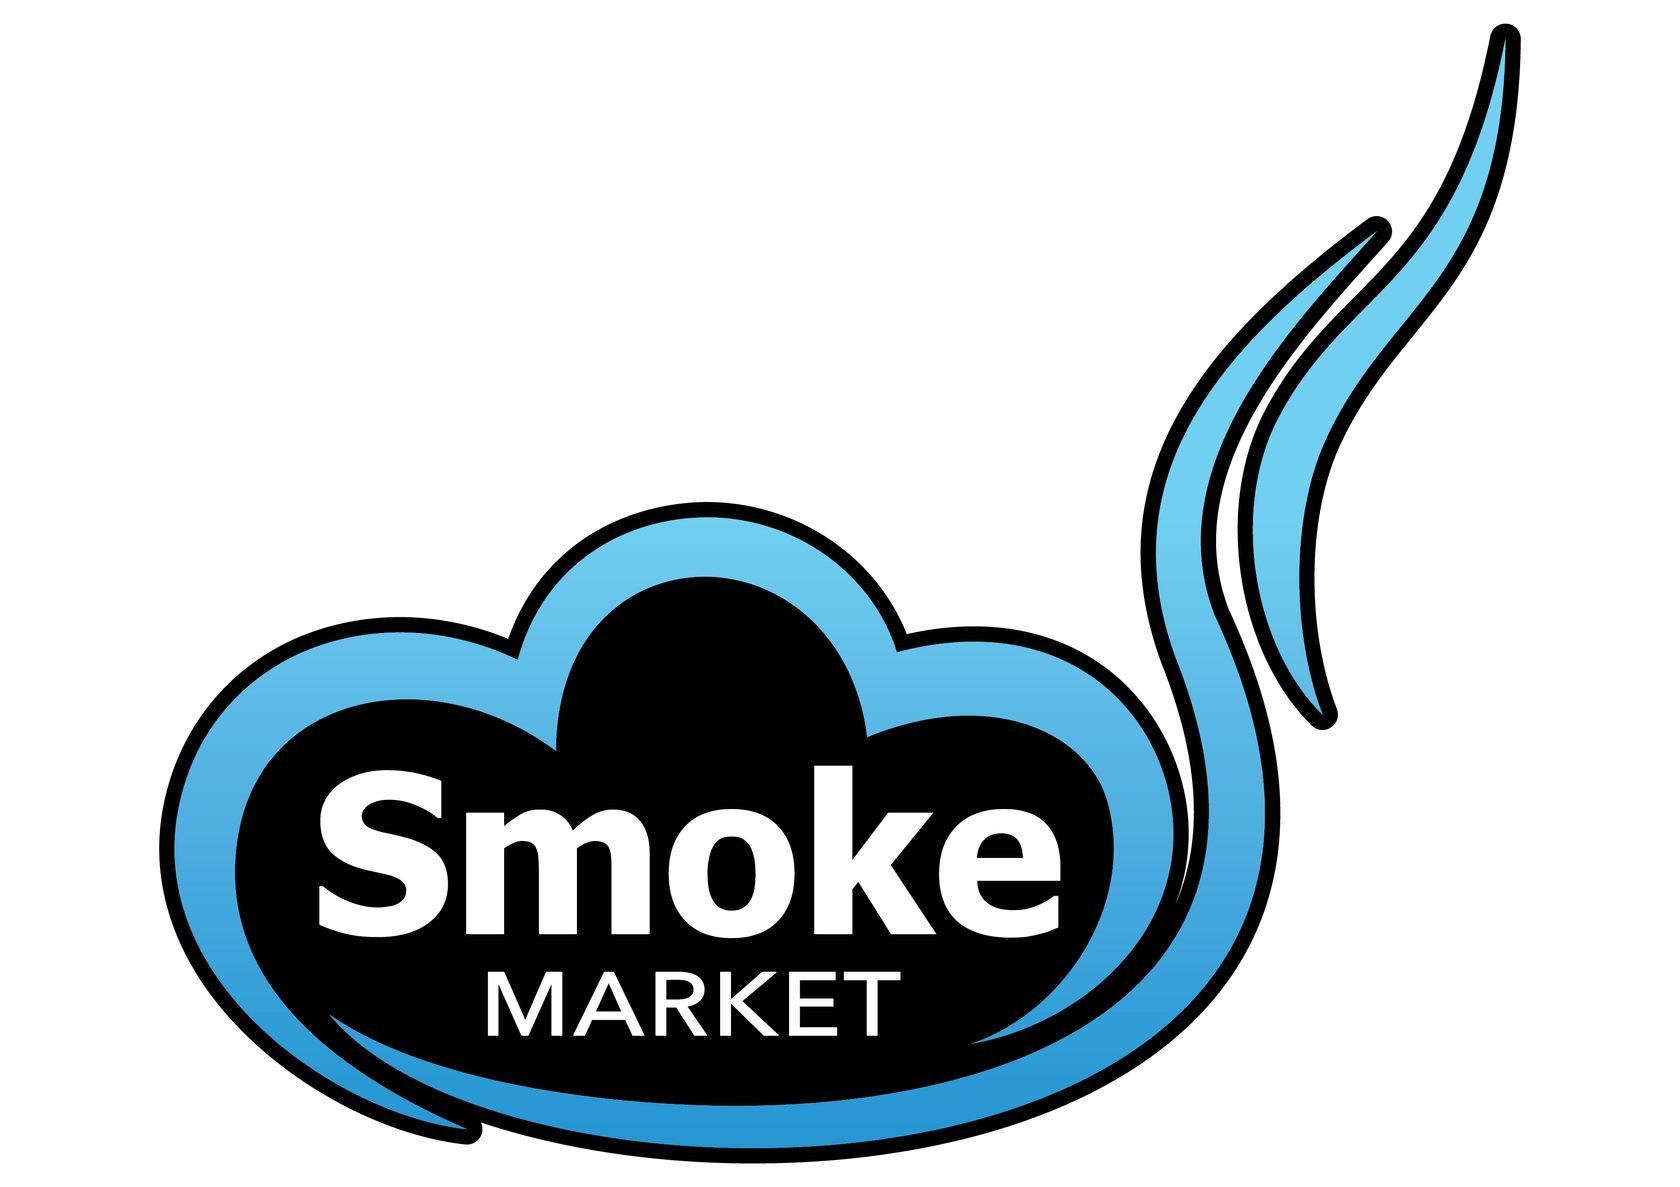 Smoke Market